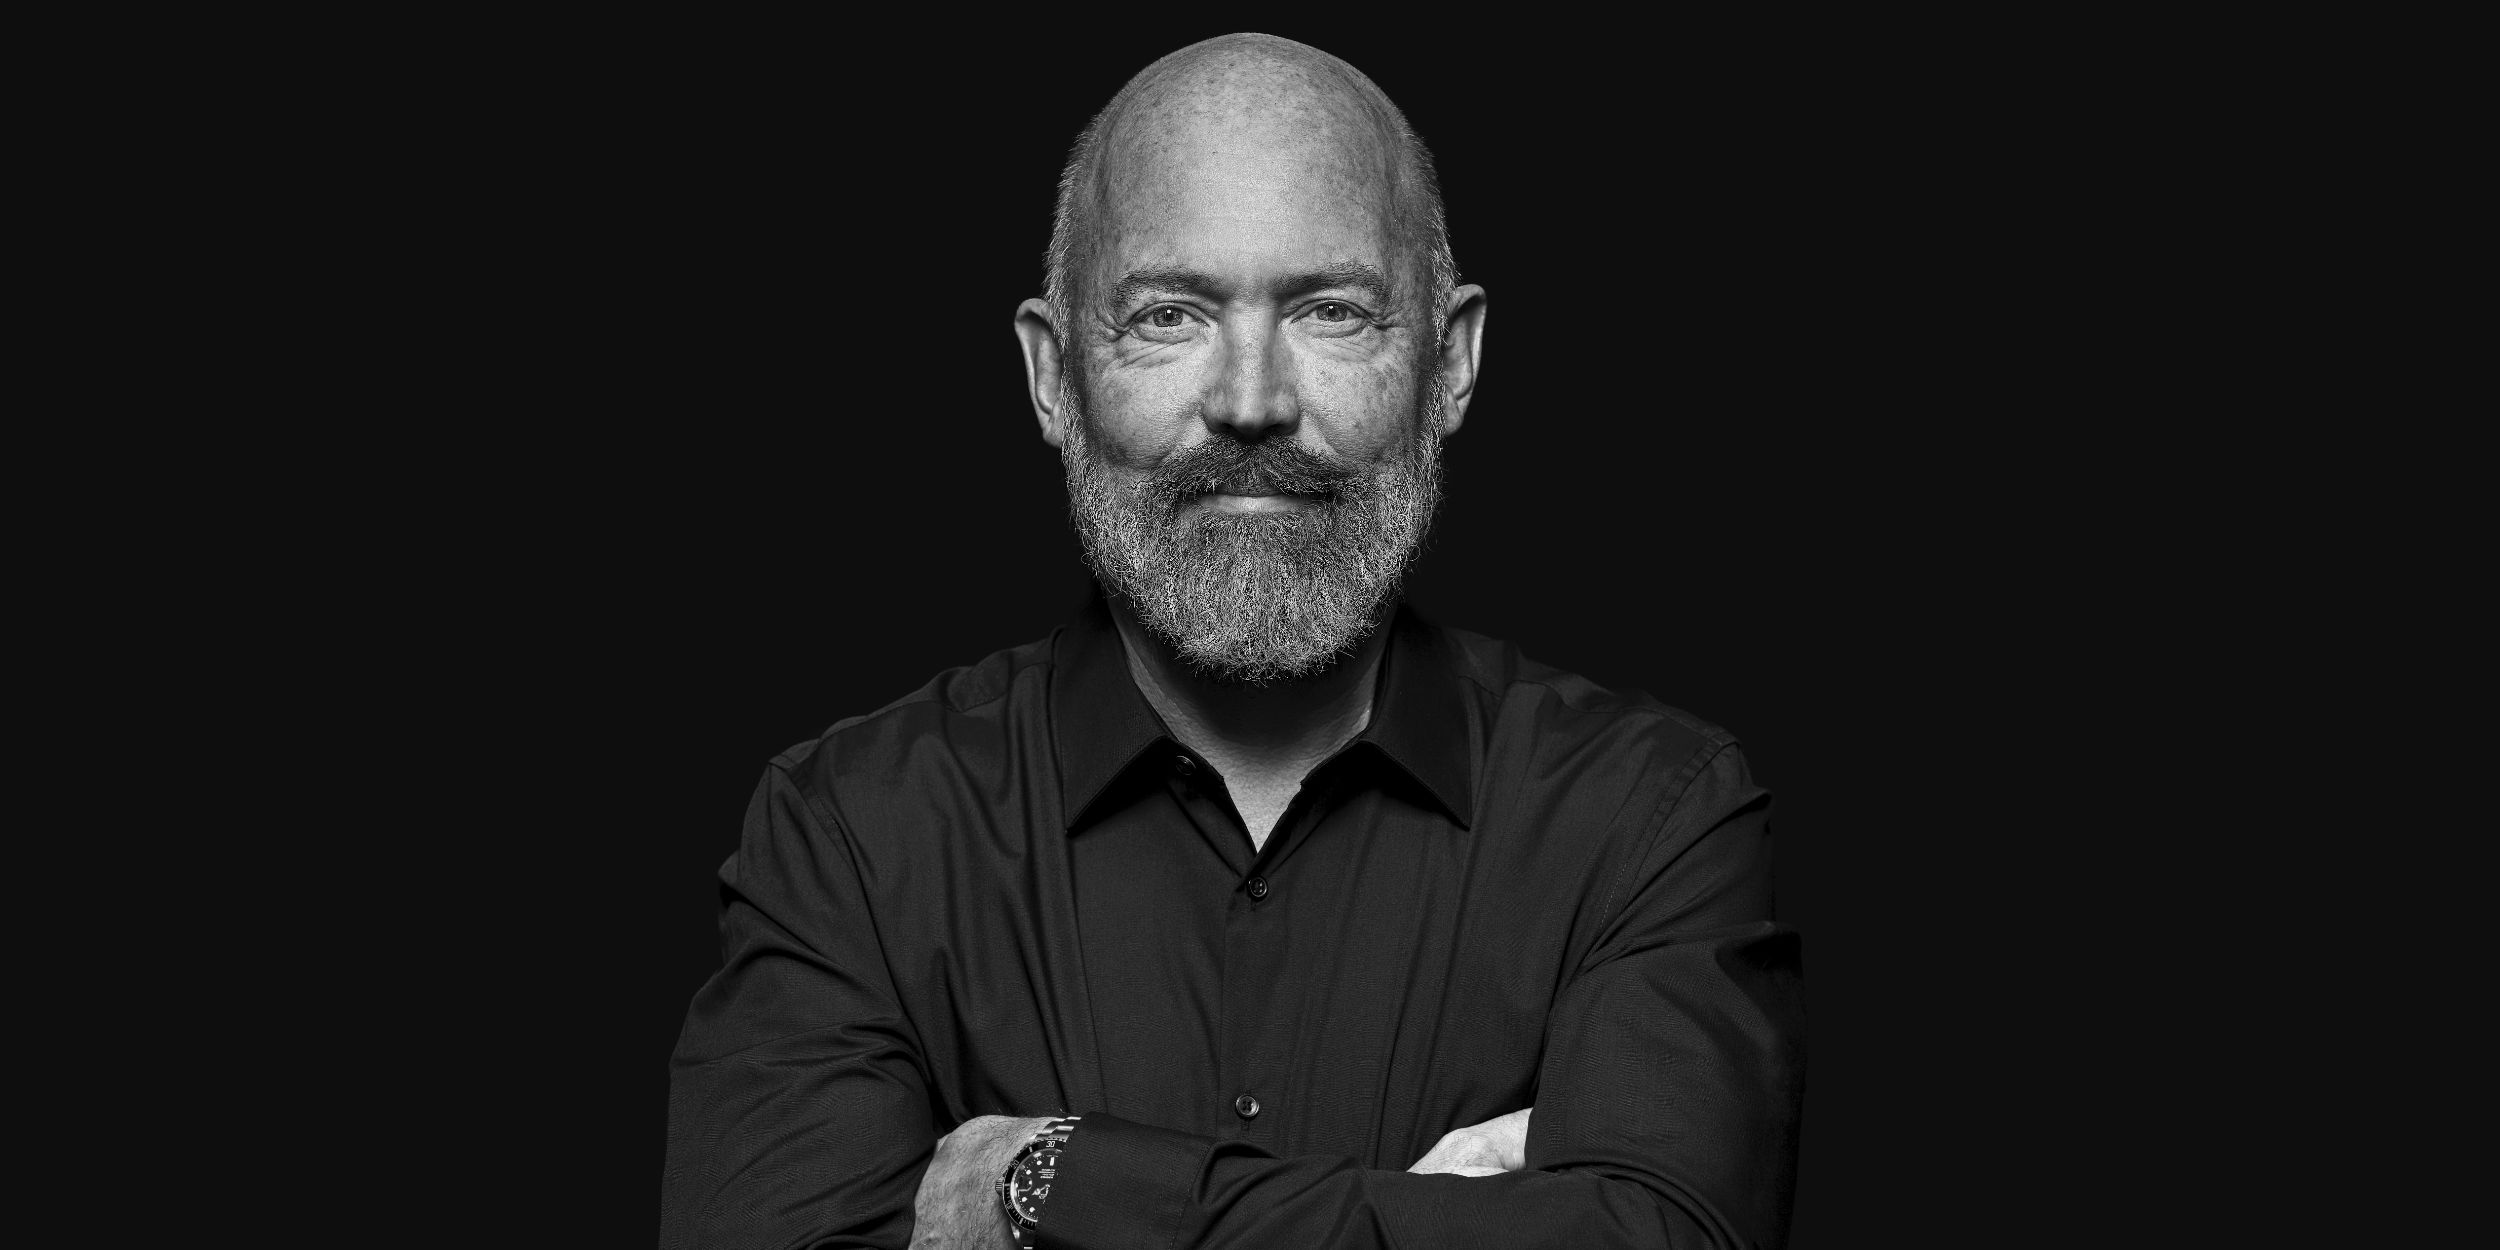 People Fotografie Stuttgart und Umgebung Charakter Portrait Jeppe Hau Knudsen executive now CEO Stuttgart